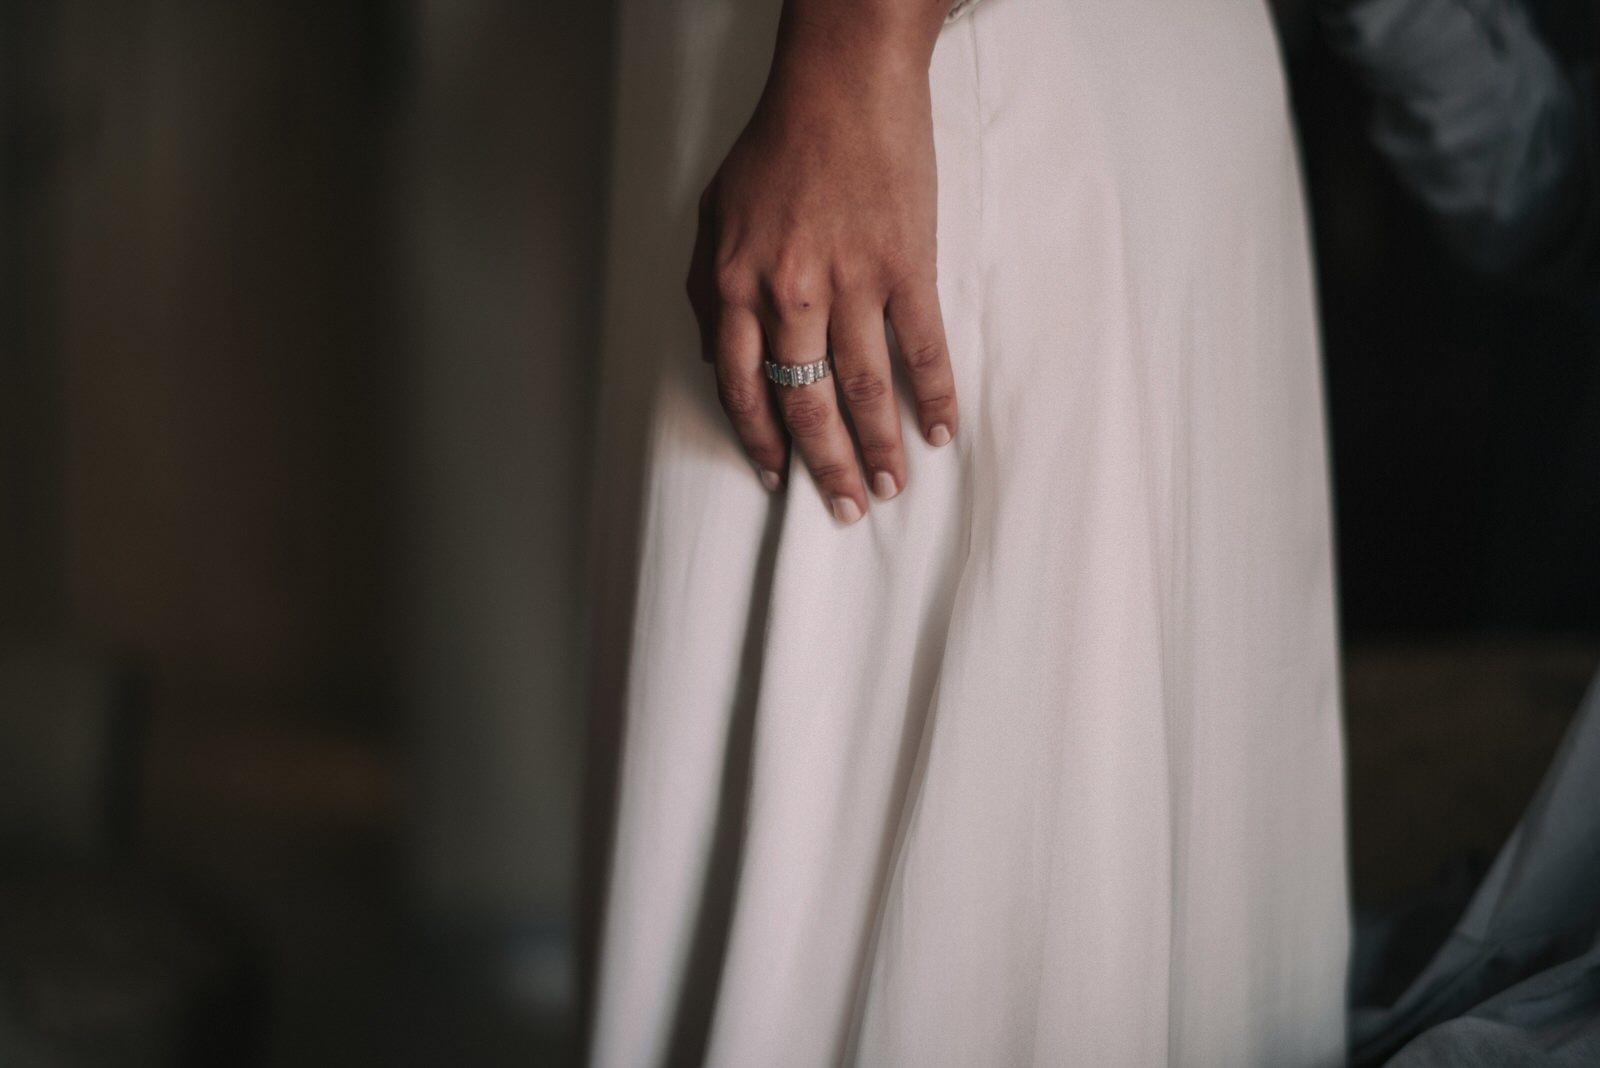 fotografo de bodas sevilla - fotografo boda - fotografía sevilla - Andrés AmarilloAAA_4341- tele- fine.JPG